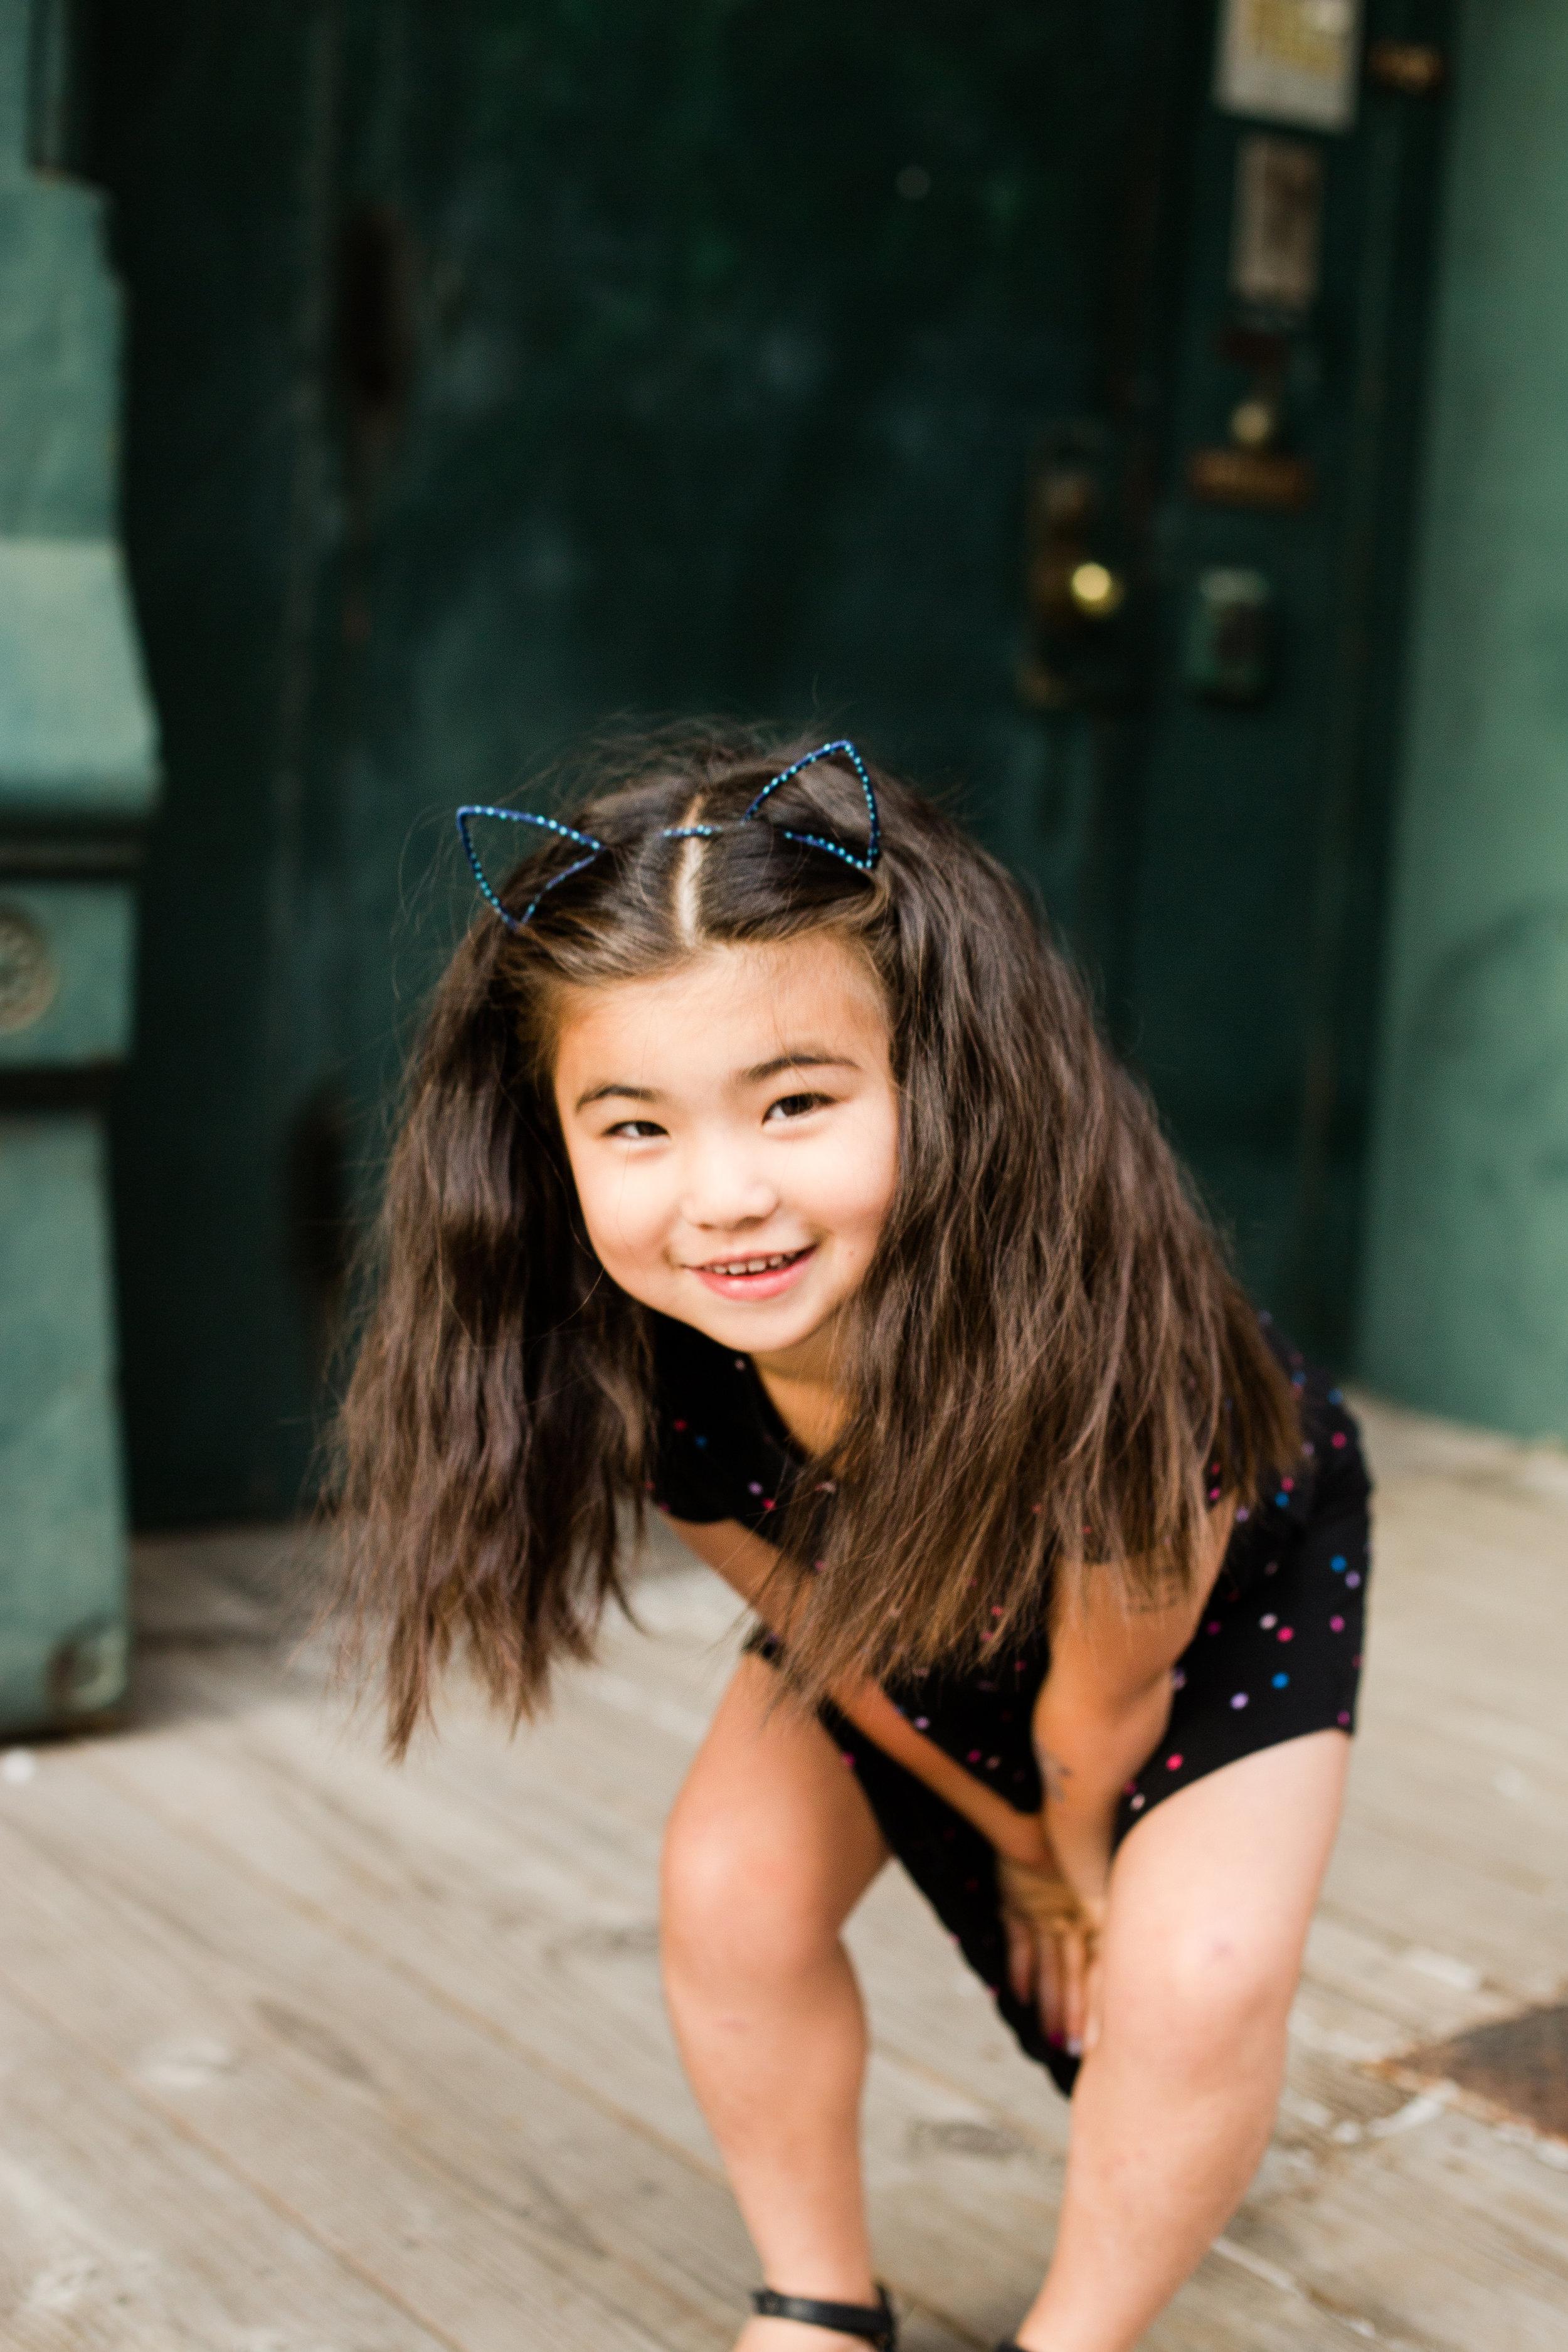 lissiephoto_loomis_nyc_family_photography2.JPG